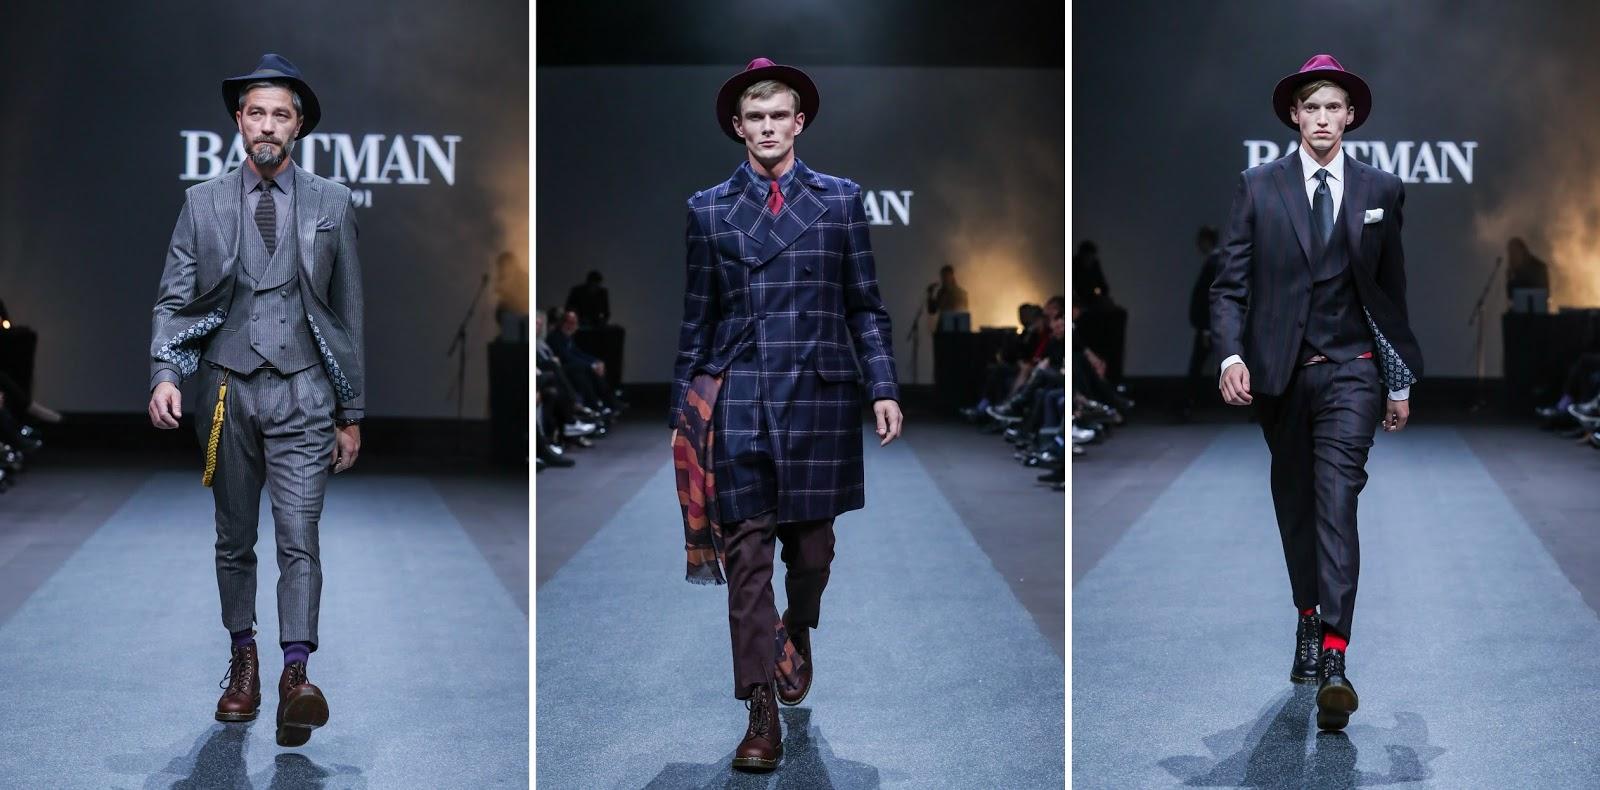 tallinn fashion week 2016 baltman